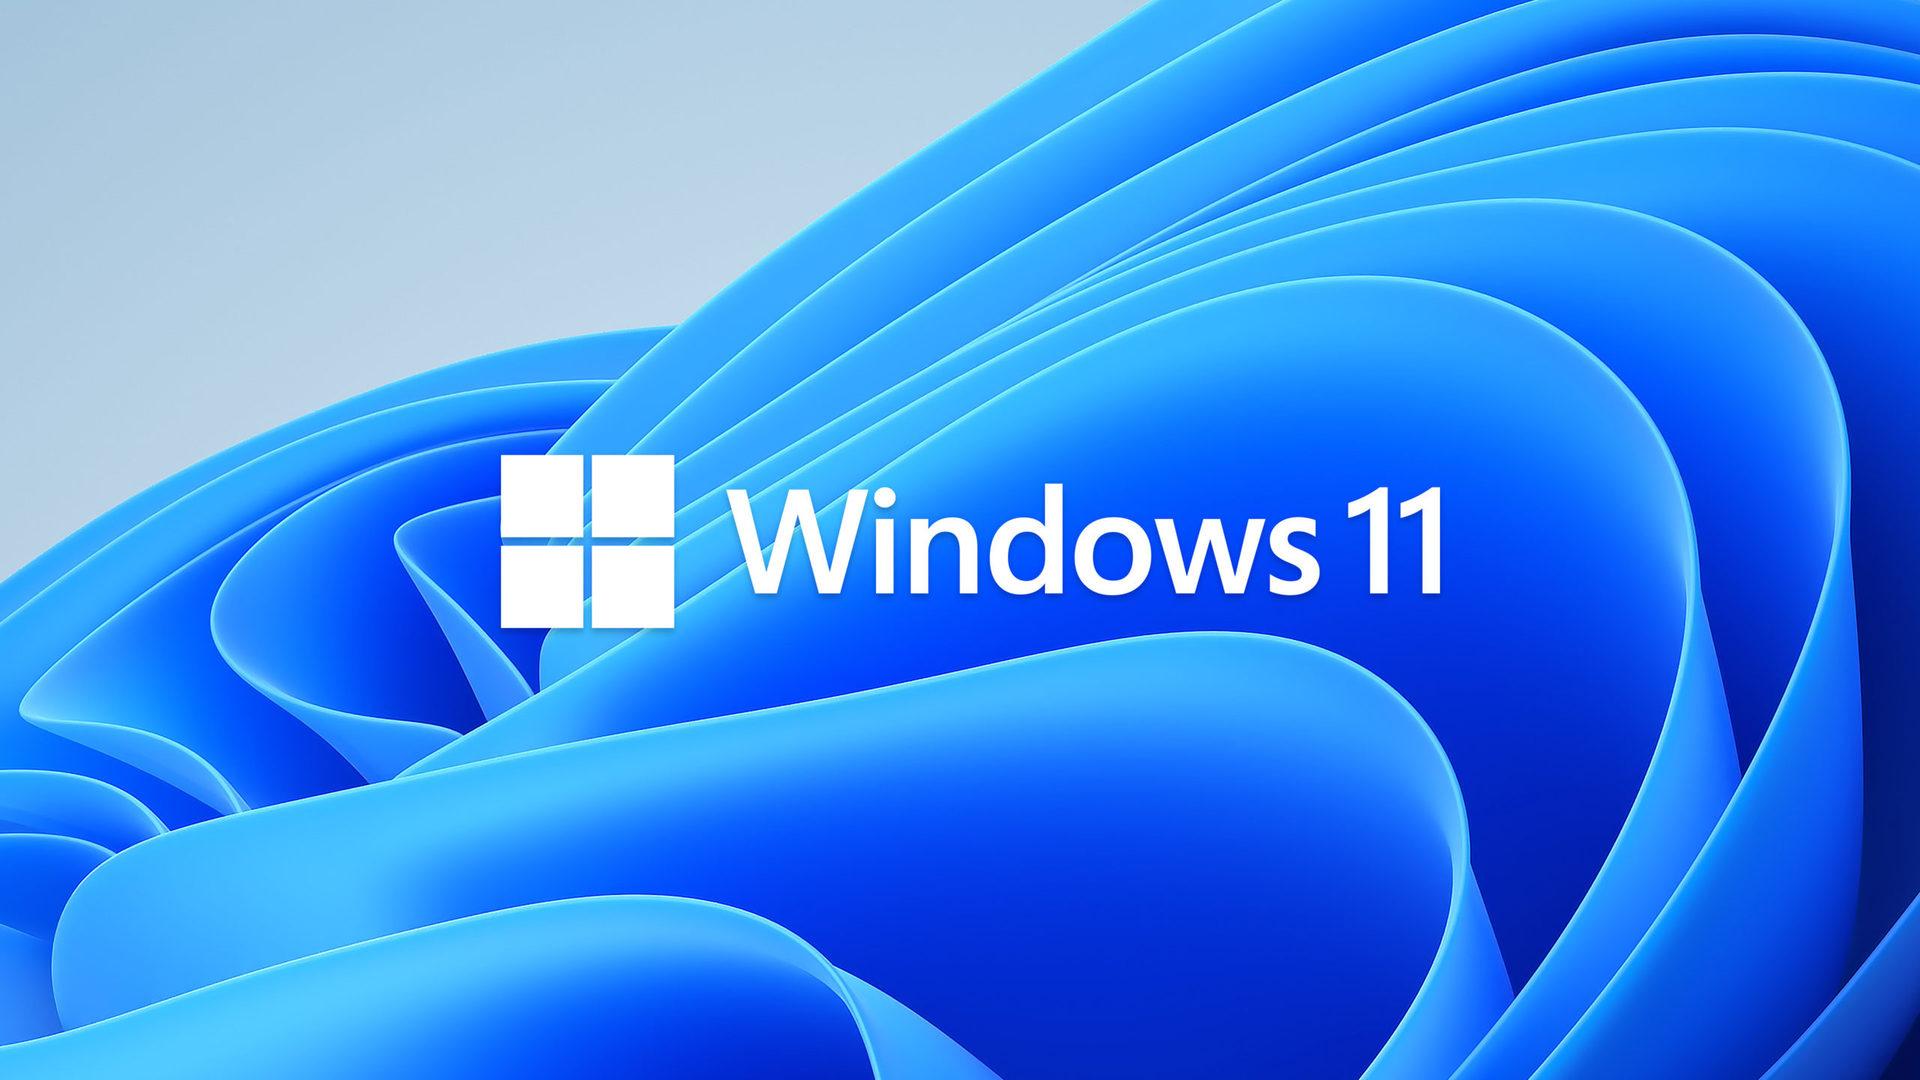 Windows 11 Hero